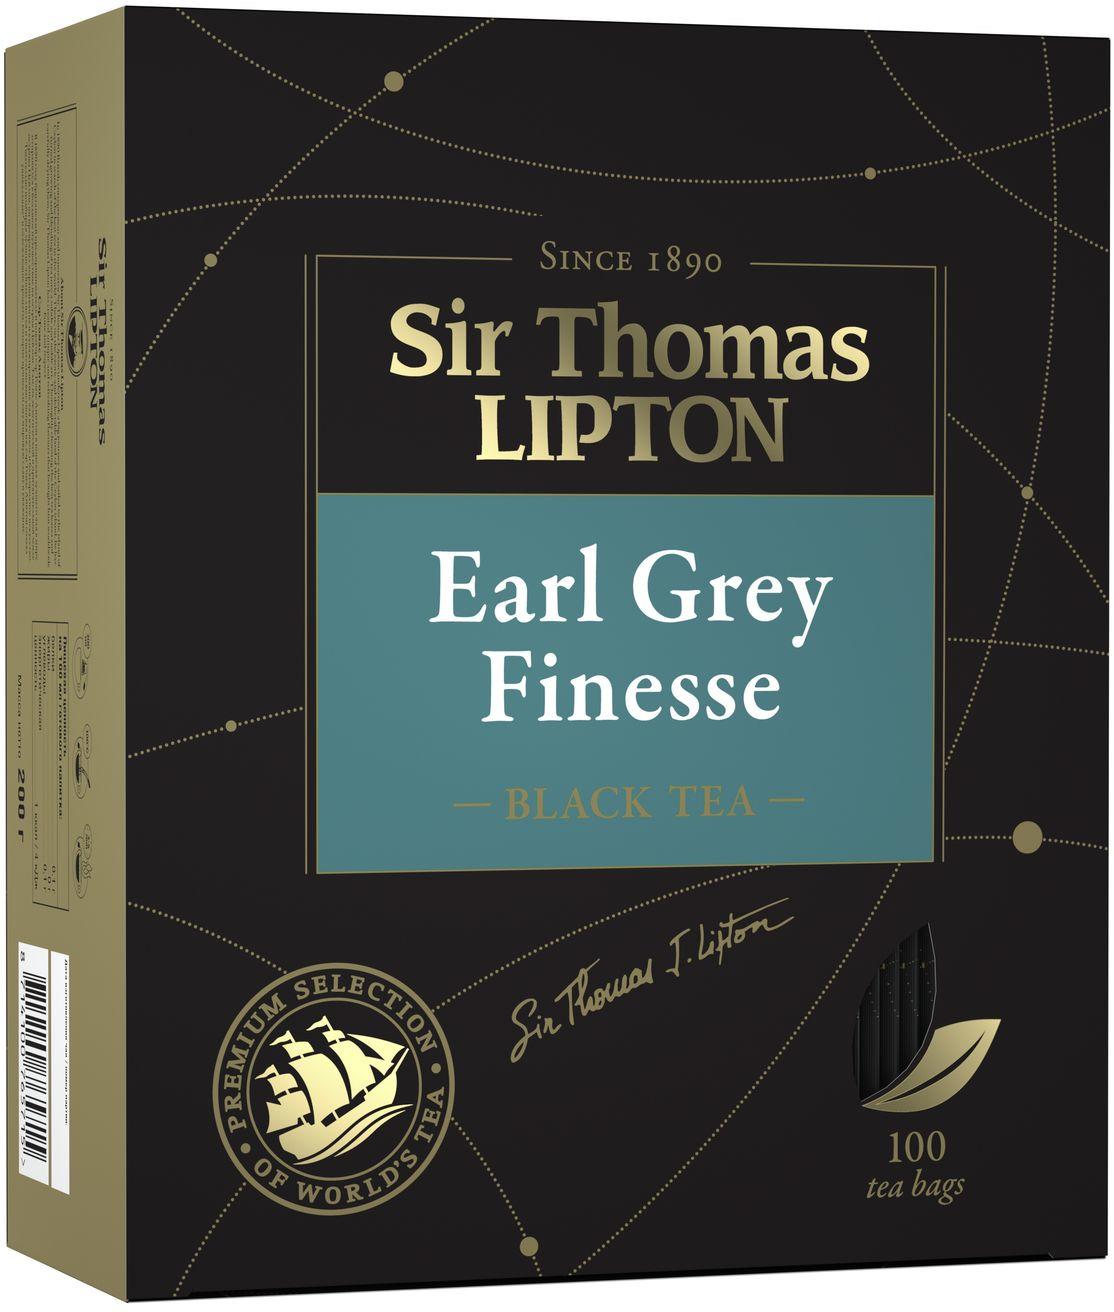 Чай в пакетиках Sir Thomas Lipton Earl Grey Finesse черный, 100 шт lipton черный чай heart of ceylon 100 шт